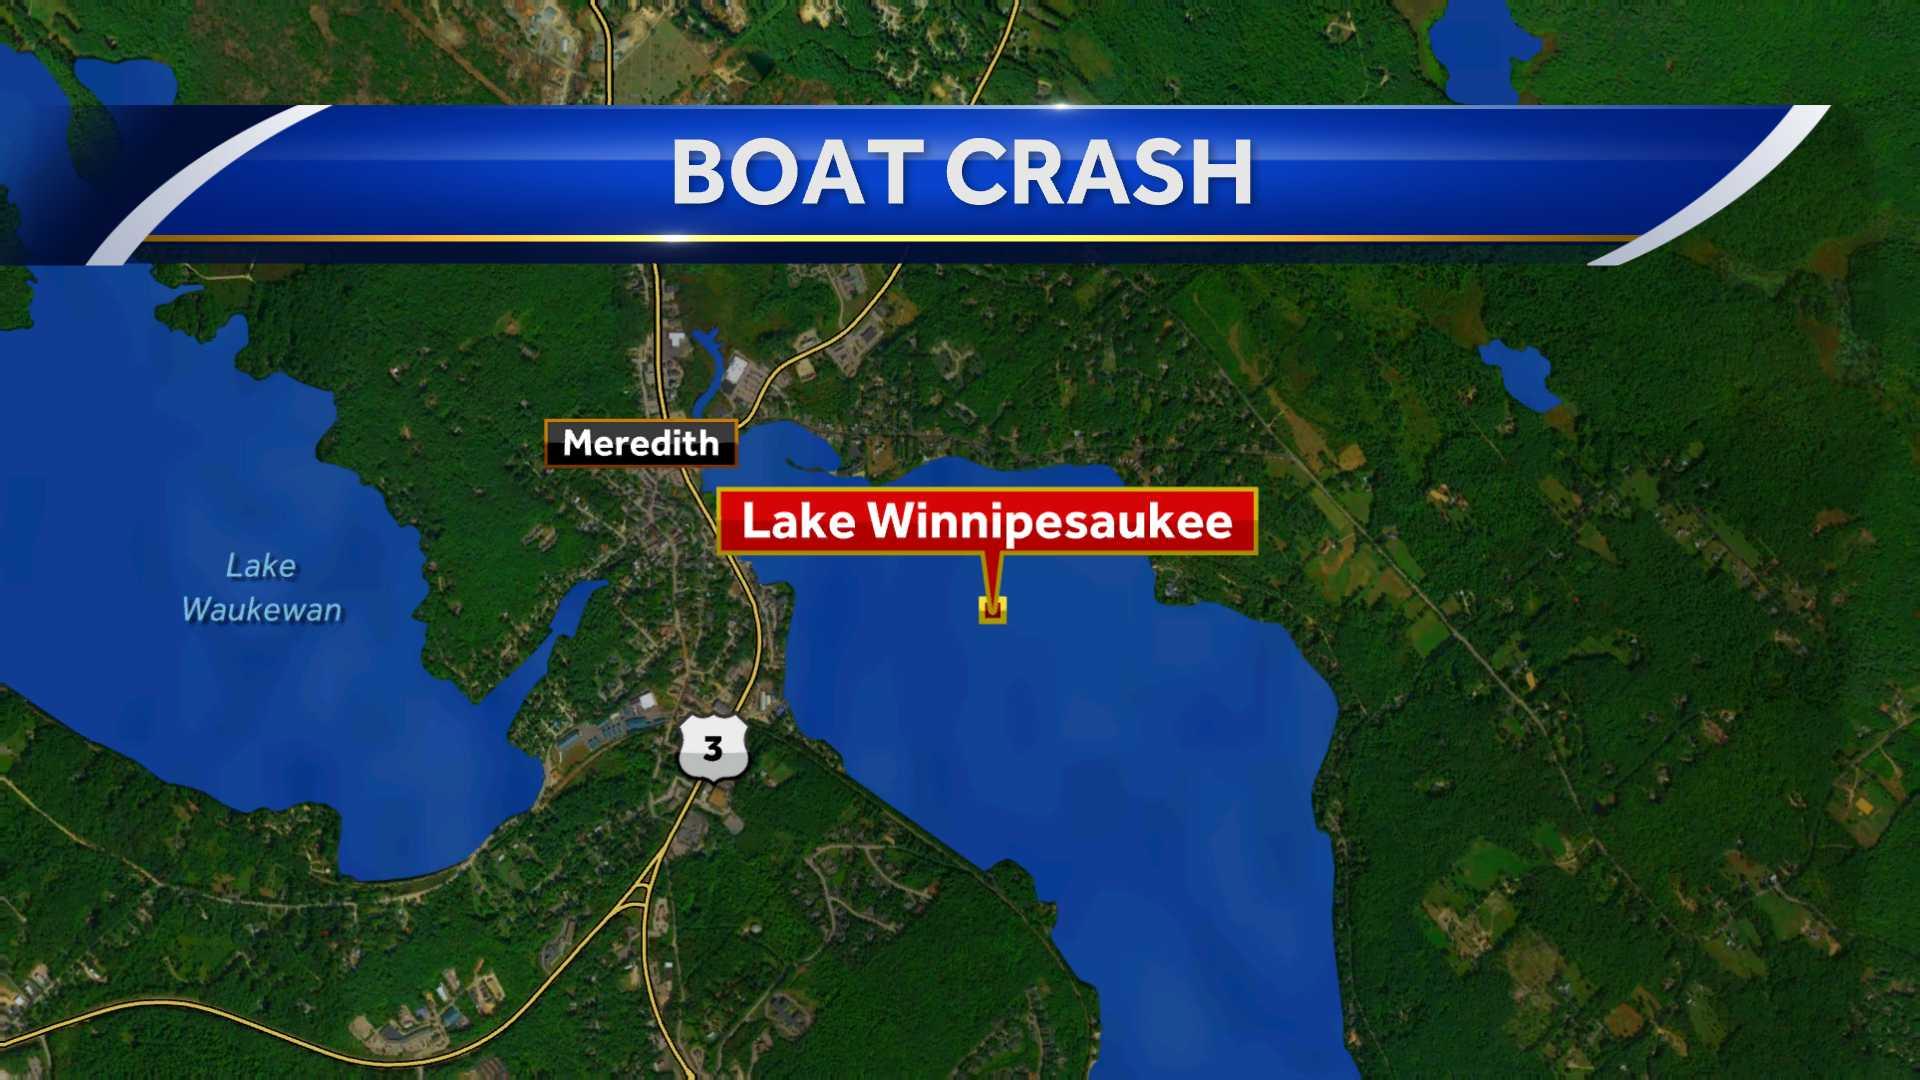 Two hurt in boat crash on Lake Winnipesaukee